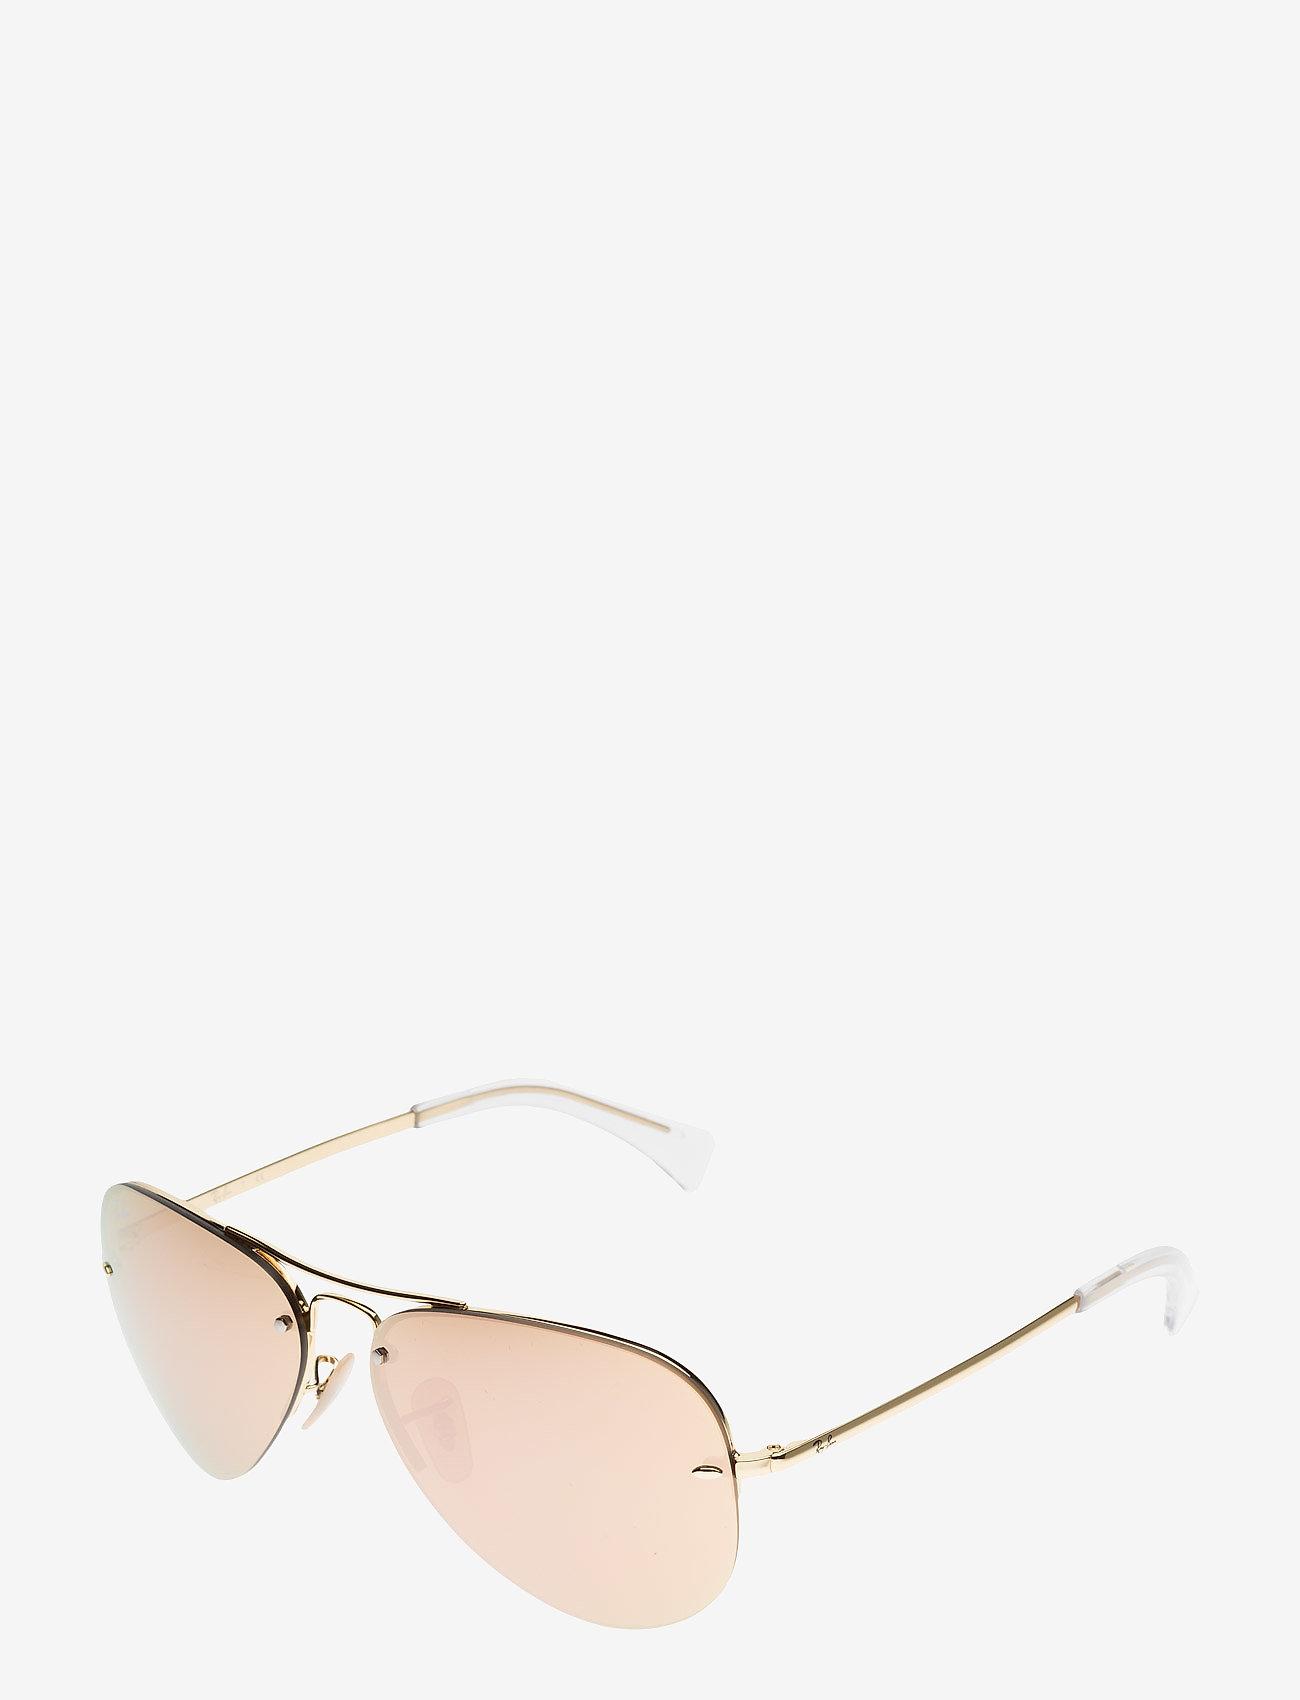 Ray-Ban - Aviator - aviatora stila - gold-light brown mirror pink - 1